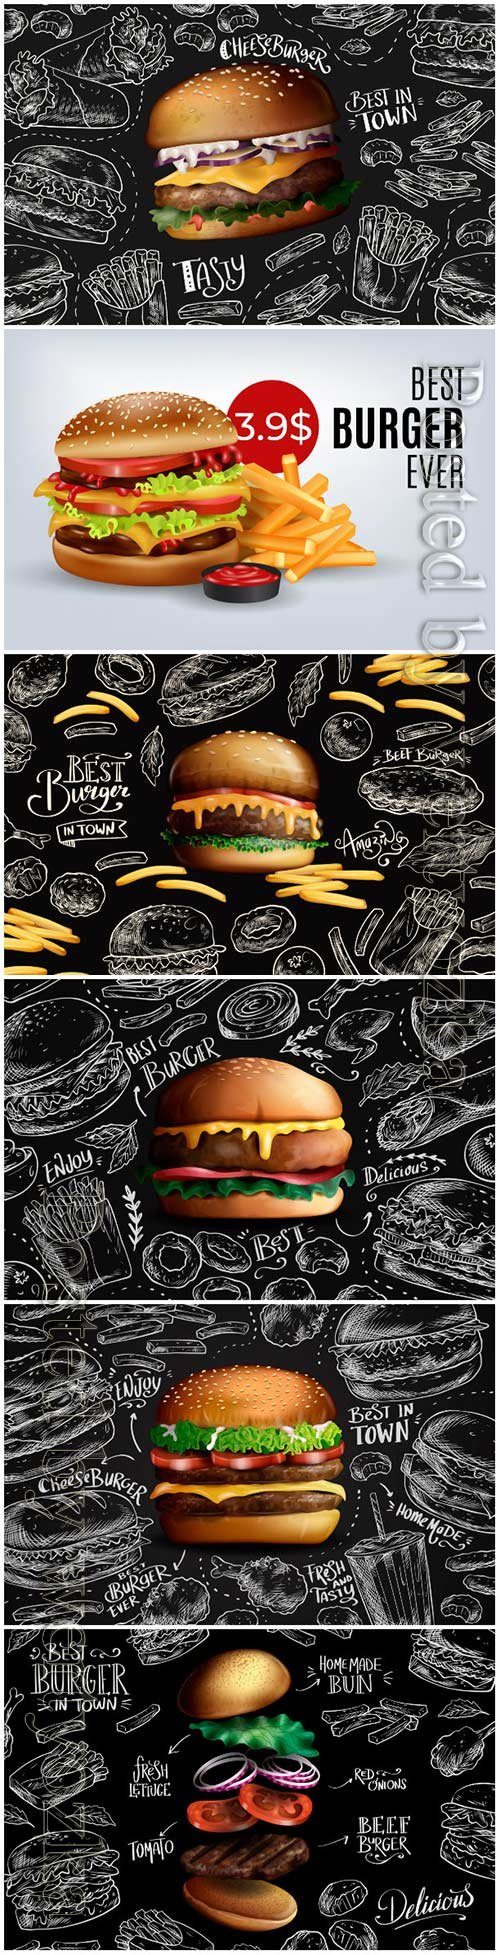 Falling realistic burger on chalkboard background